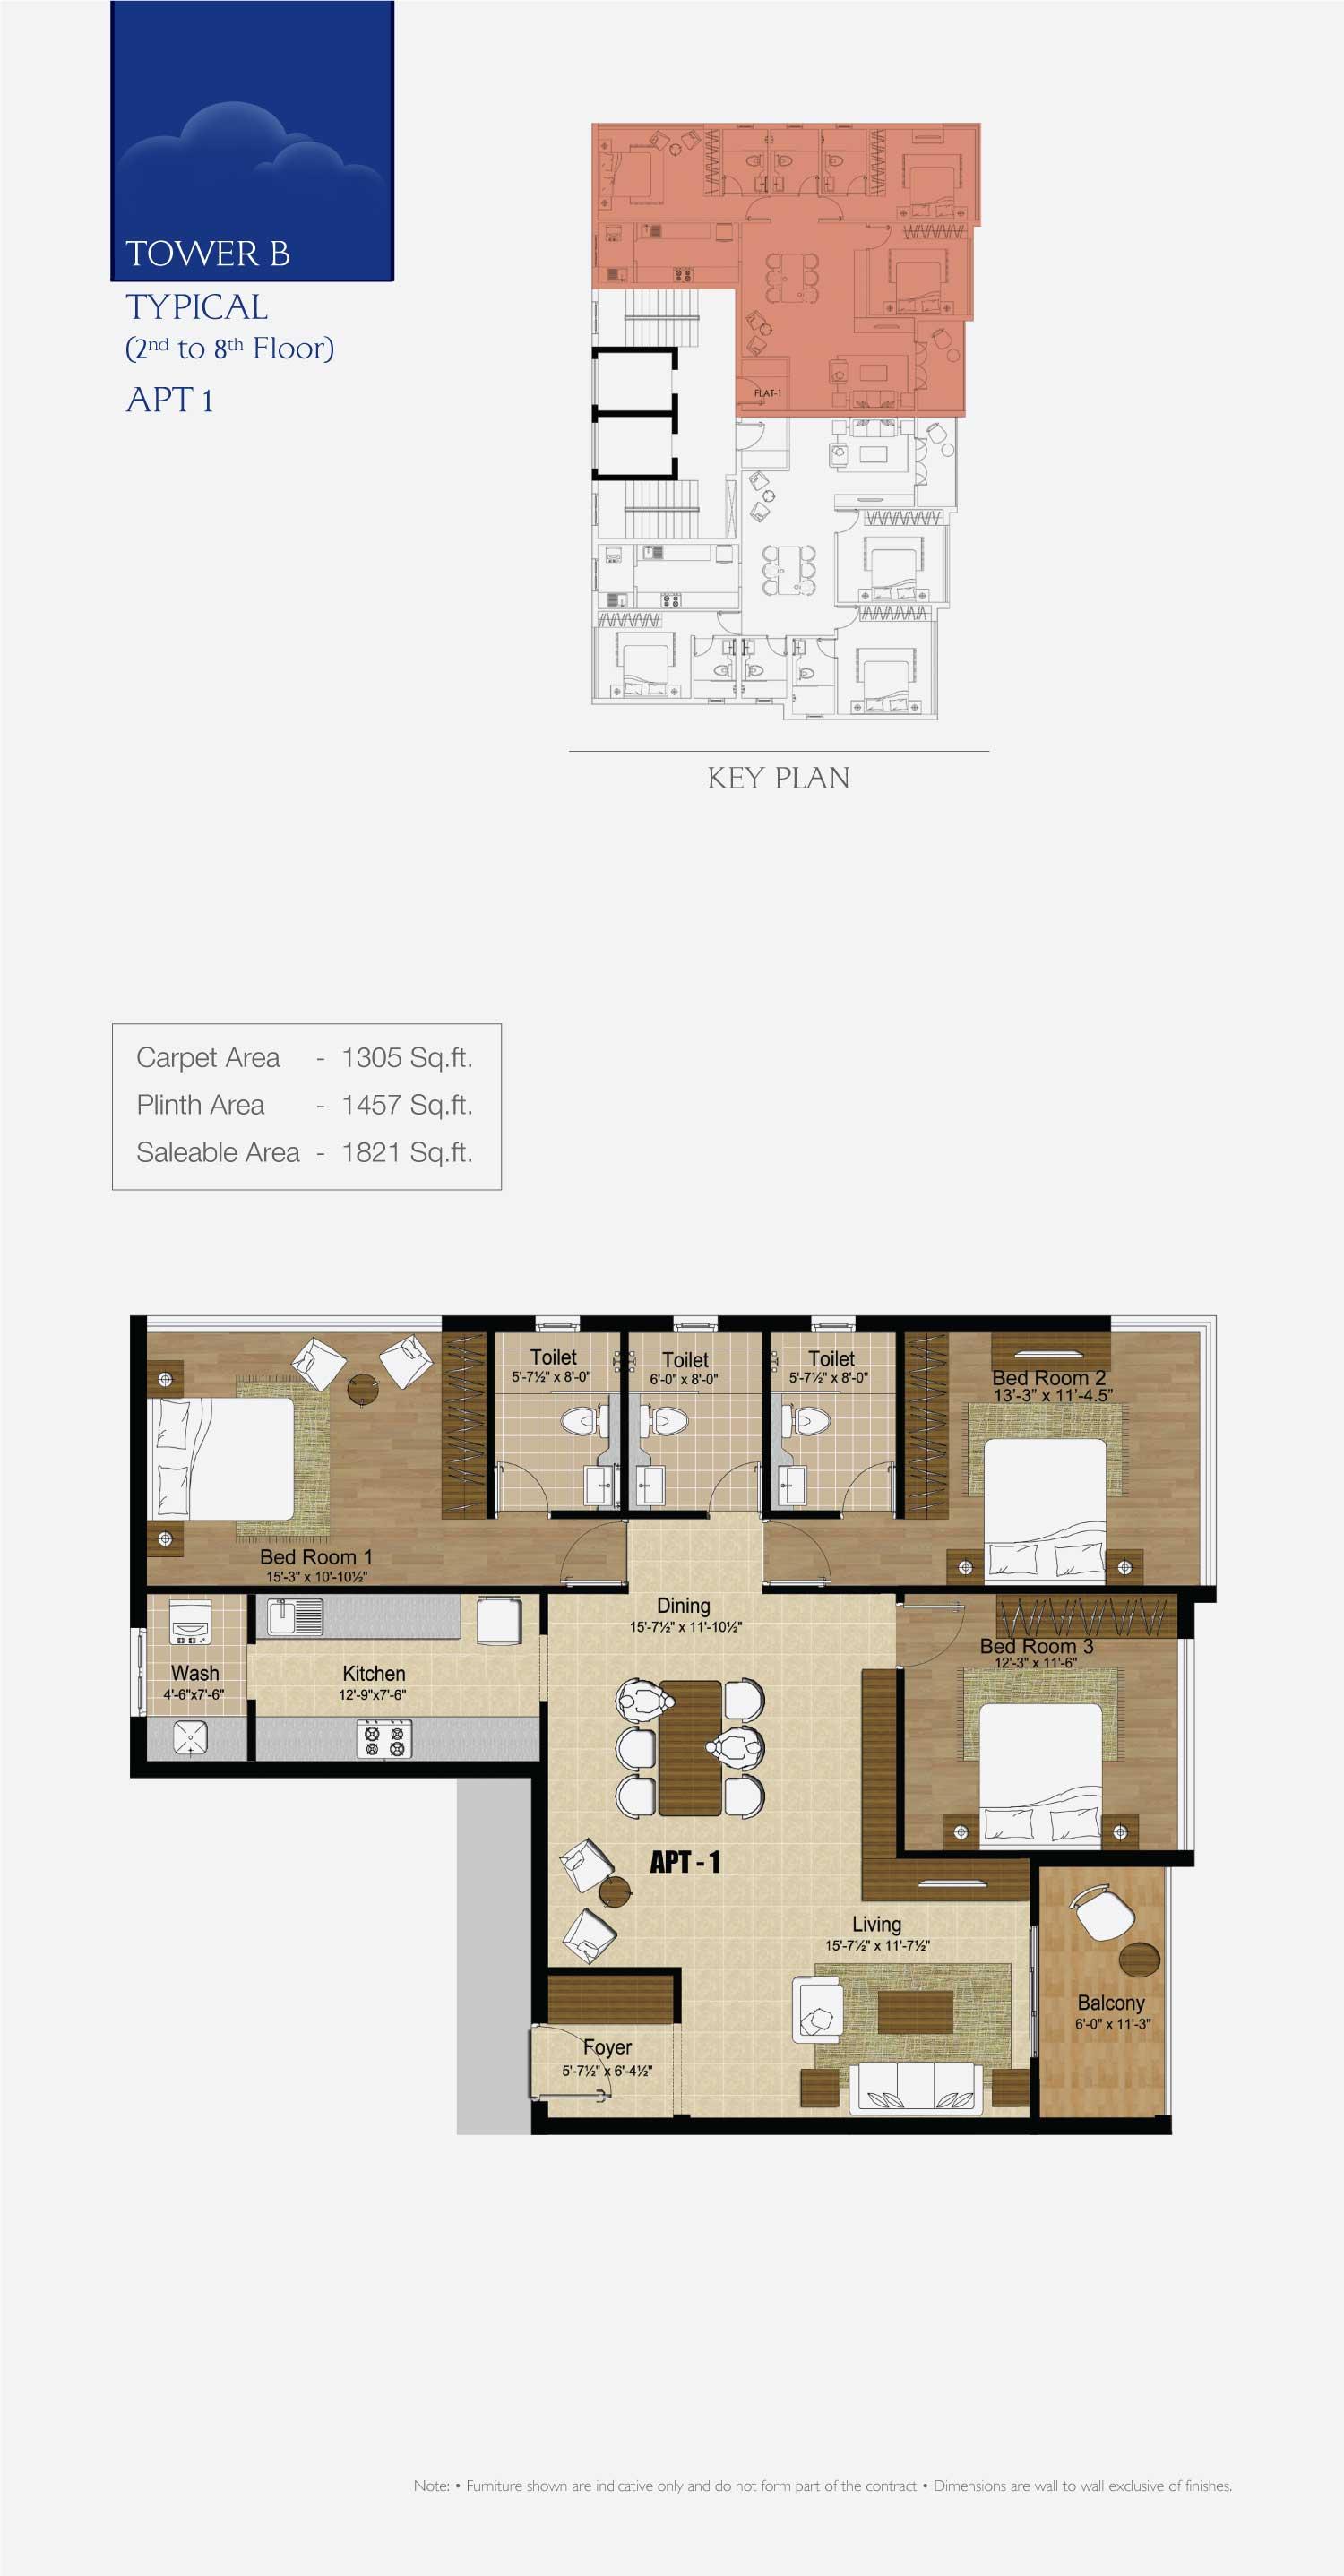 Premium Flats And Apartments In Valasaravakkam Chennai Kiruba Cirrus Electrical Wiring Diagram 3 Bedroom Flat Tower B Typical Apt1